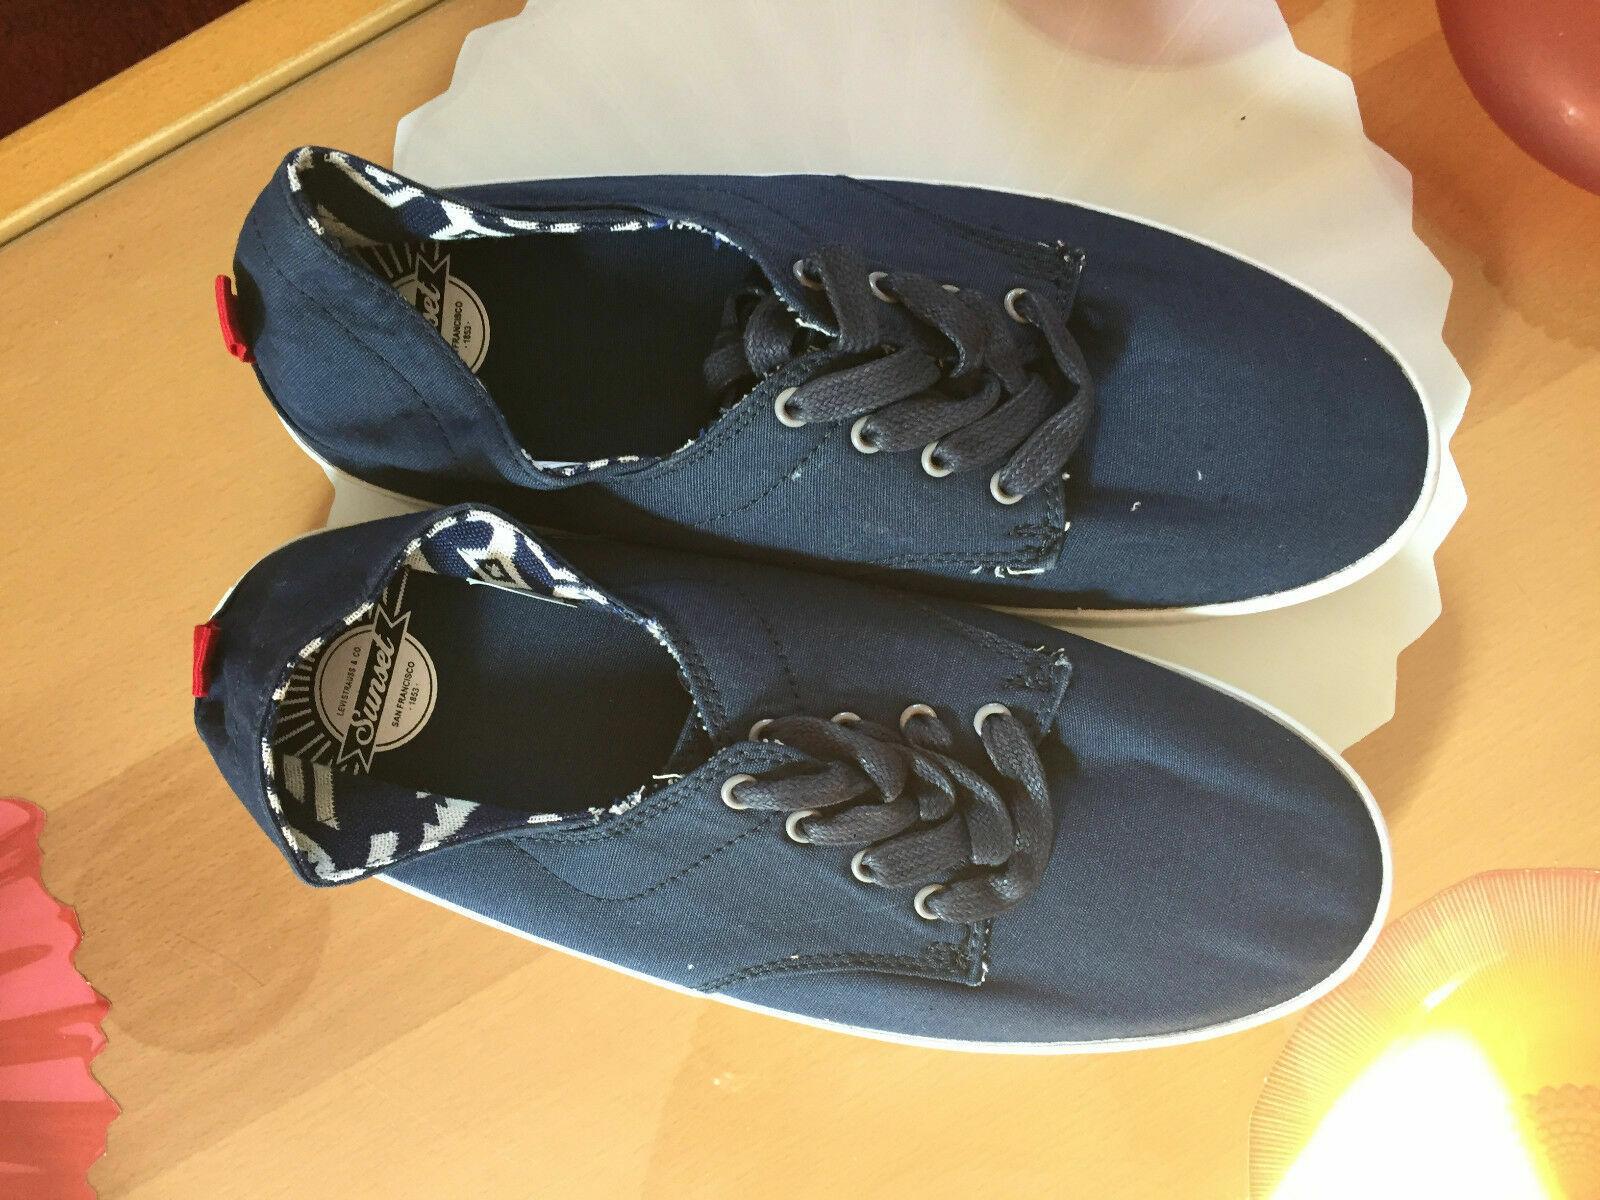 Chaussures tennis sneakers bleu marine levis 41 neuves